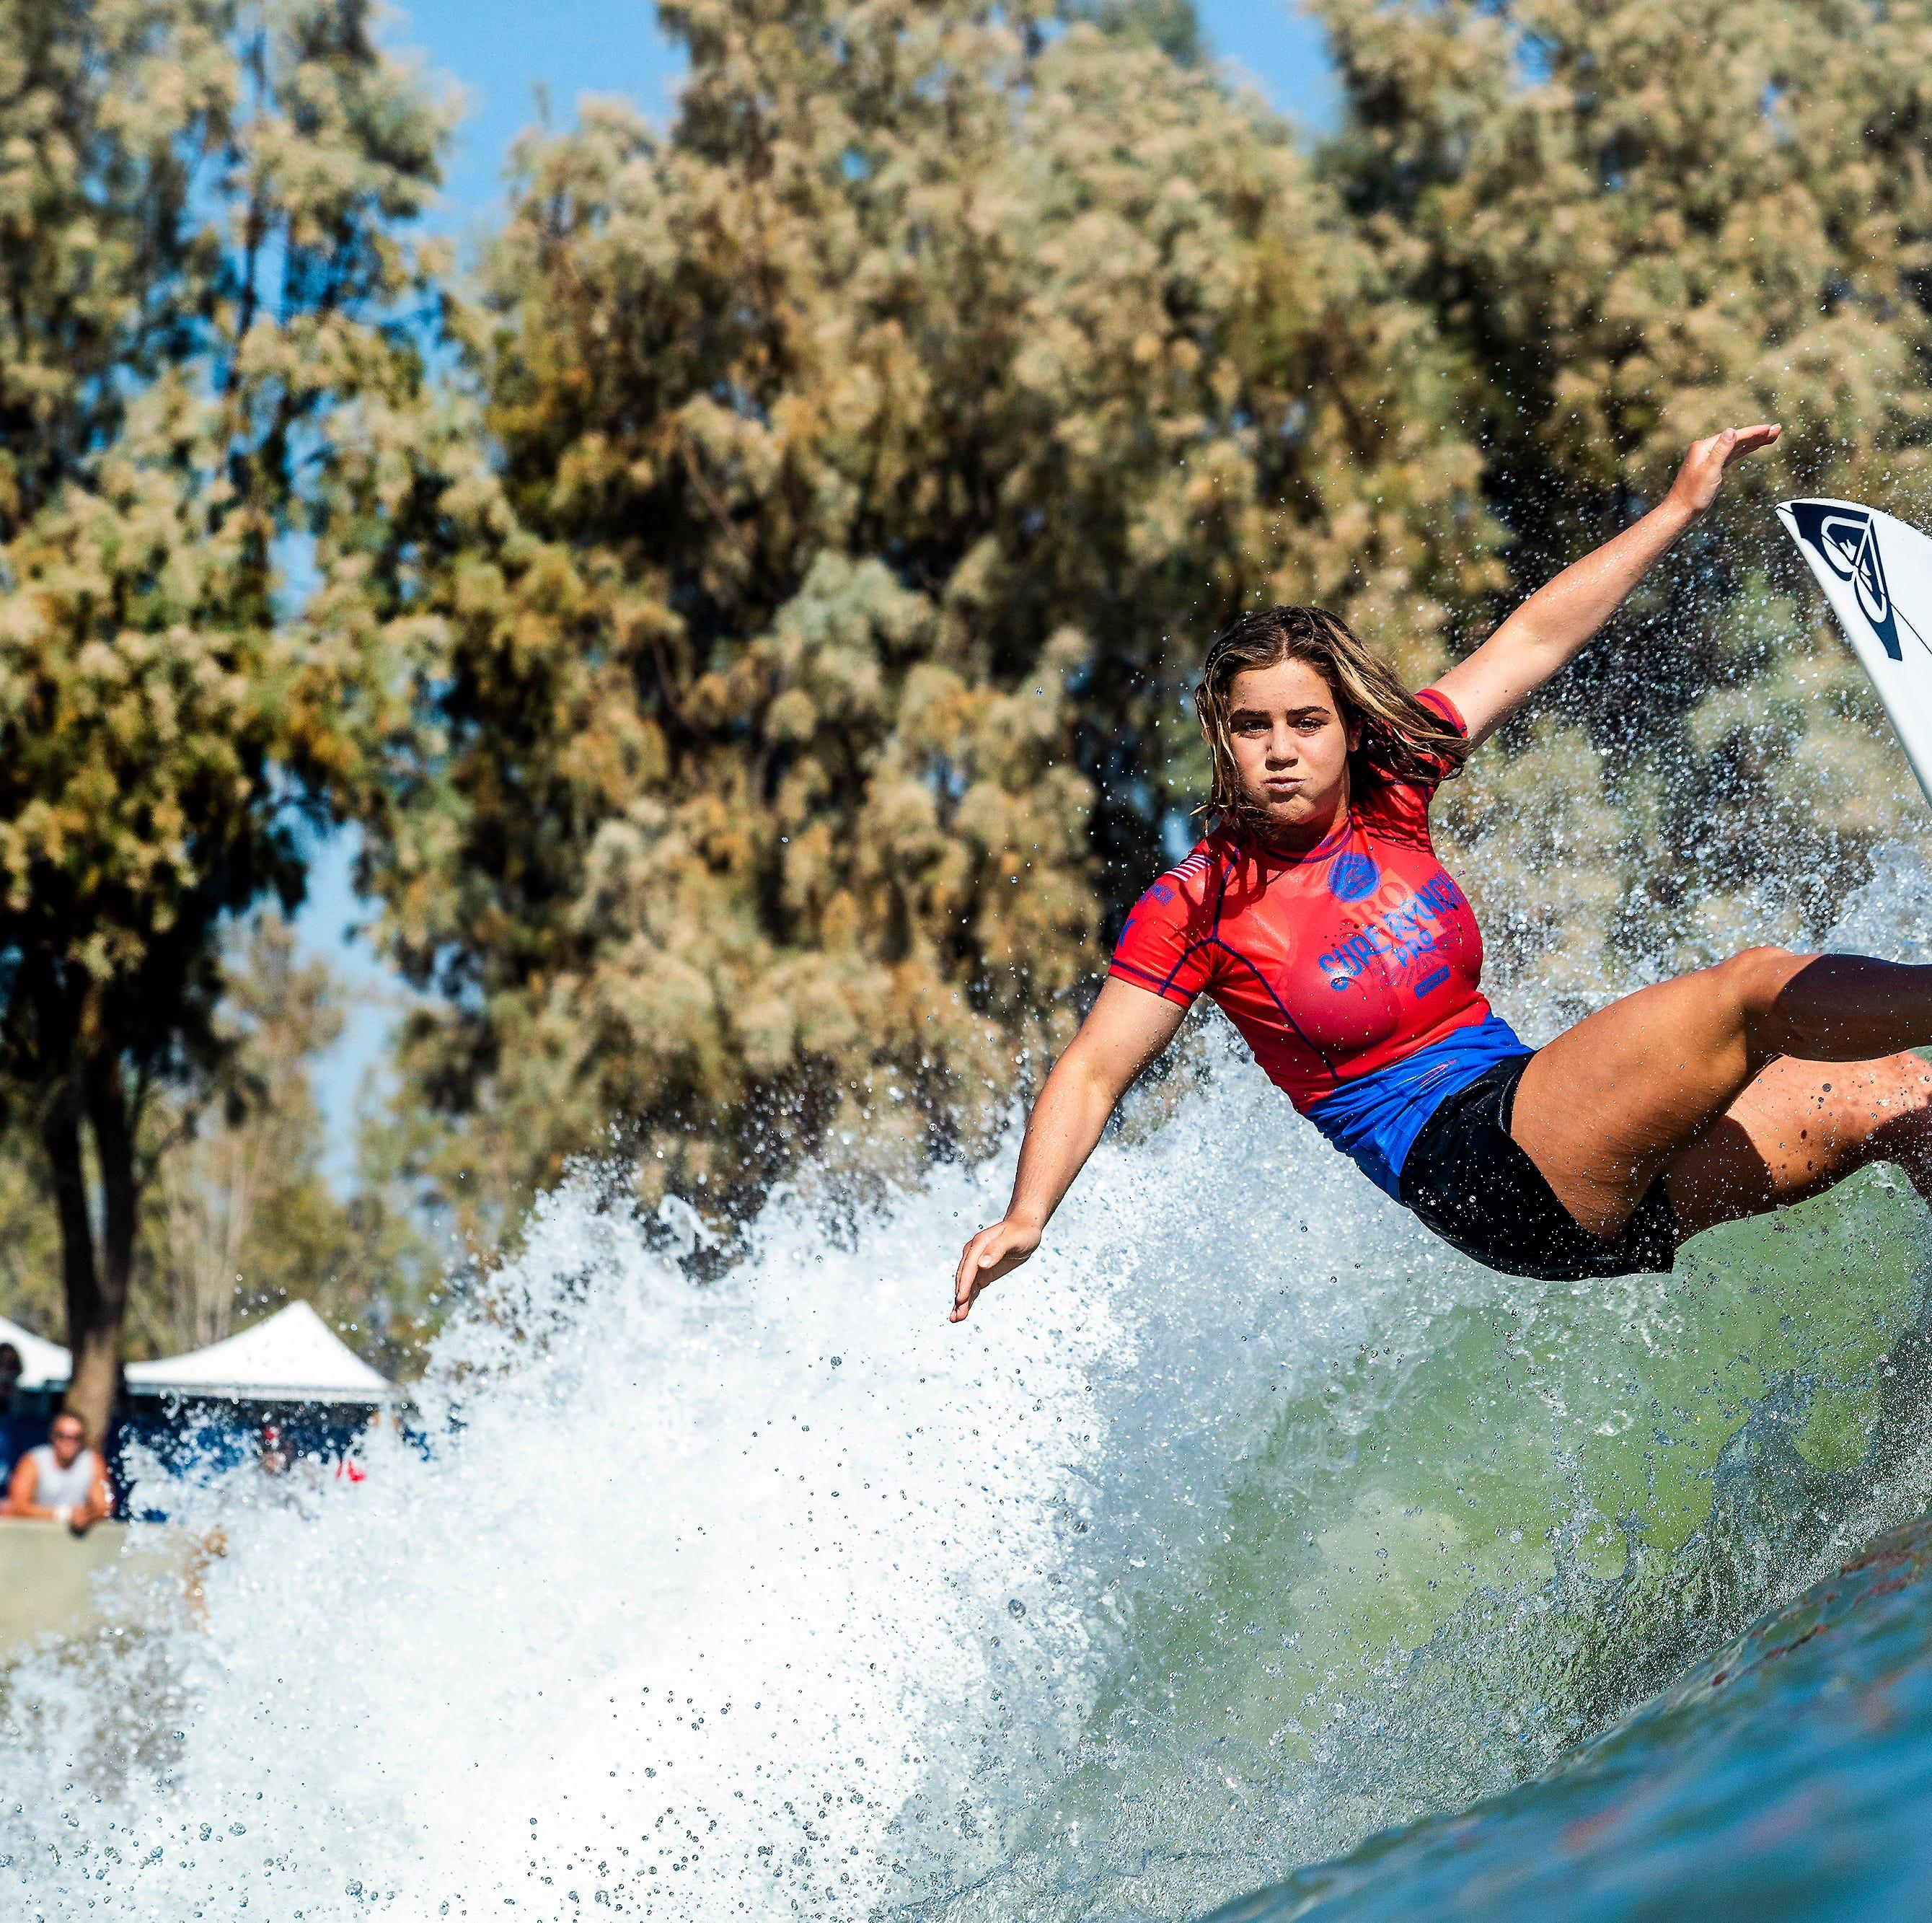 Ron Jon statue, equal pay, fans stoke surfing superstar Caroline Marks